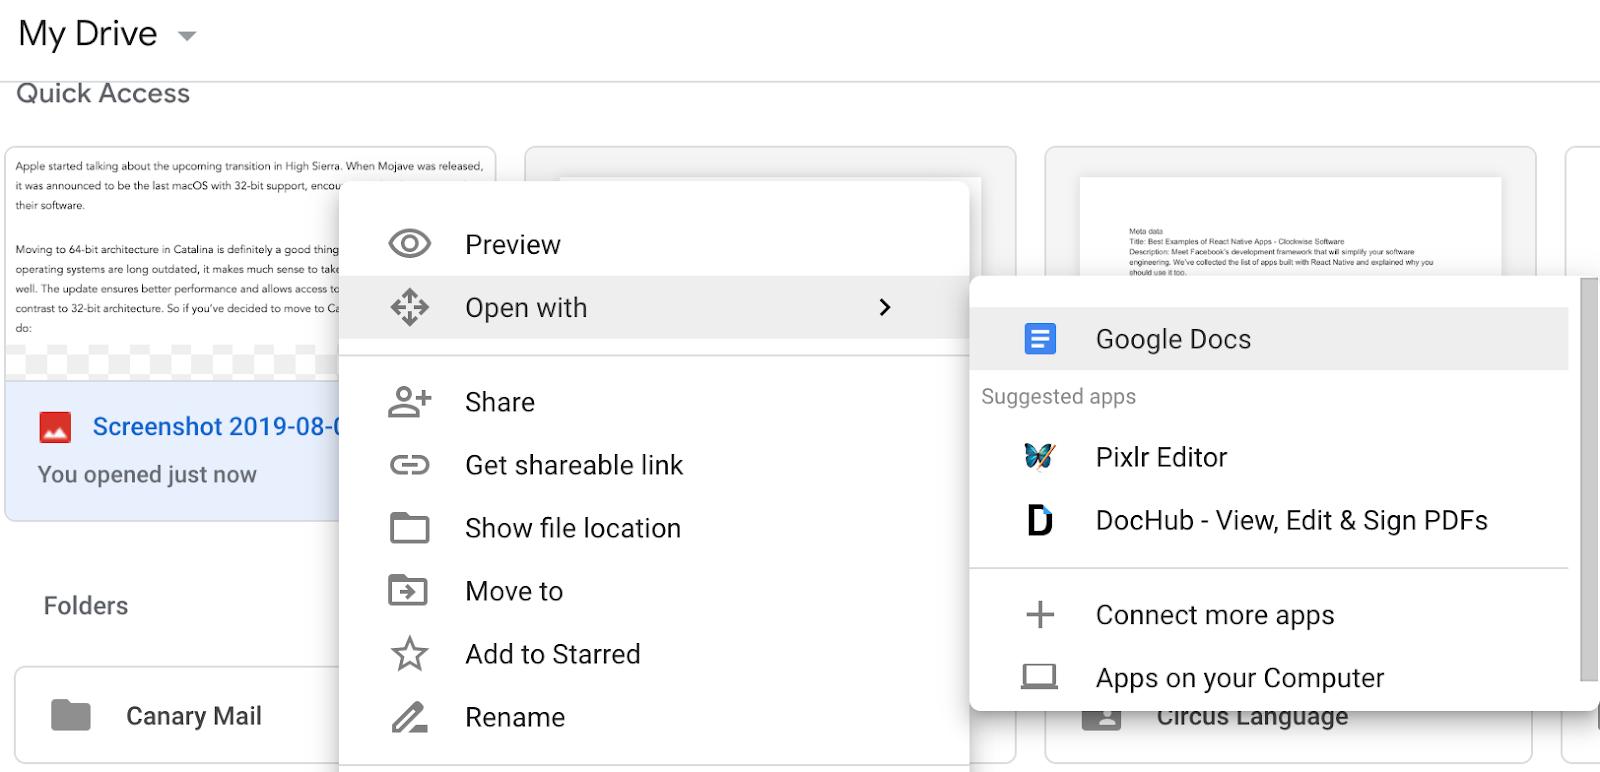 Upload the screenshot to Google Drive